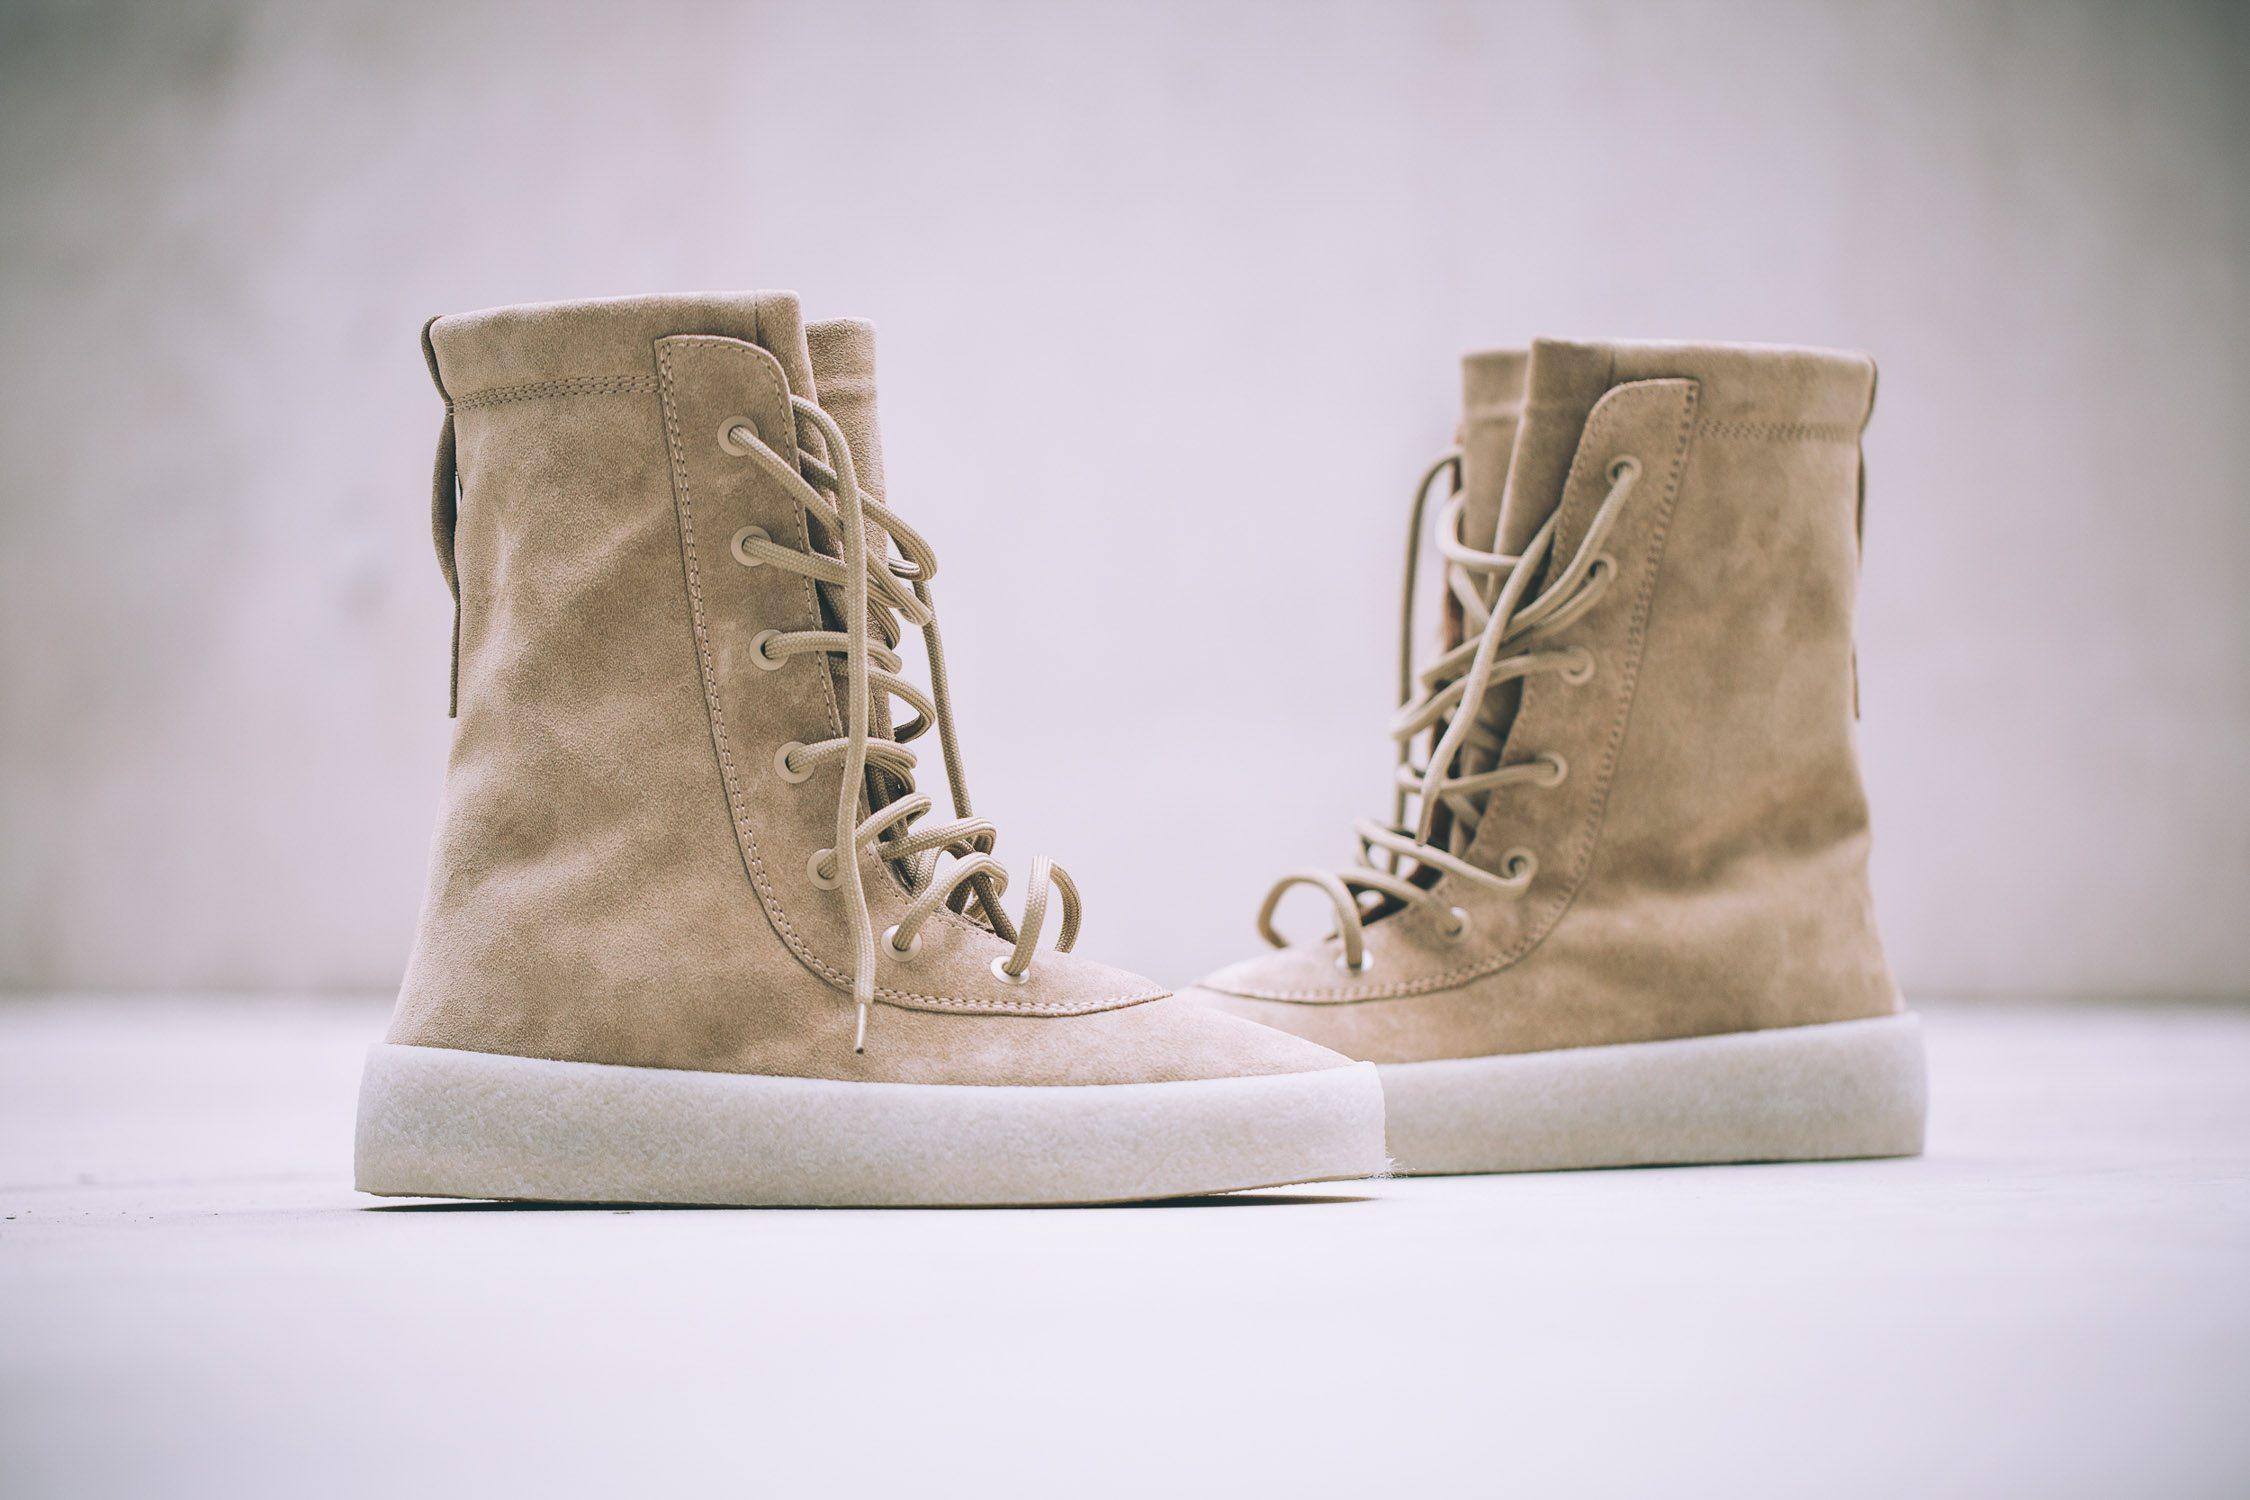 adidas Originals x Kanye West Crepe Boot 2